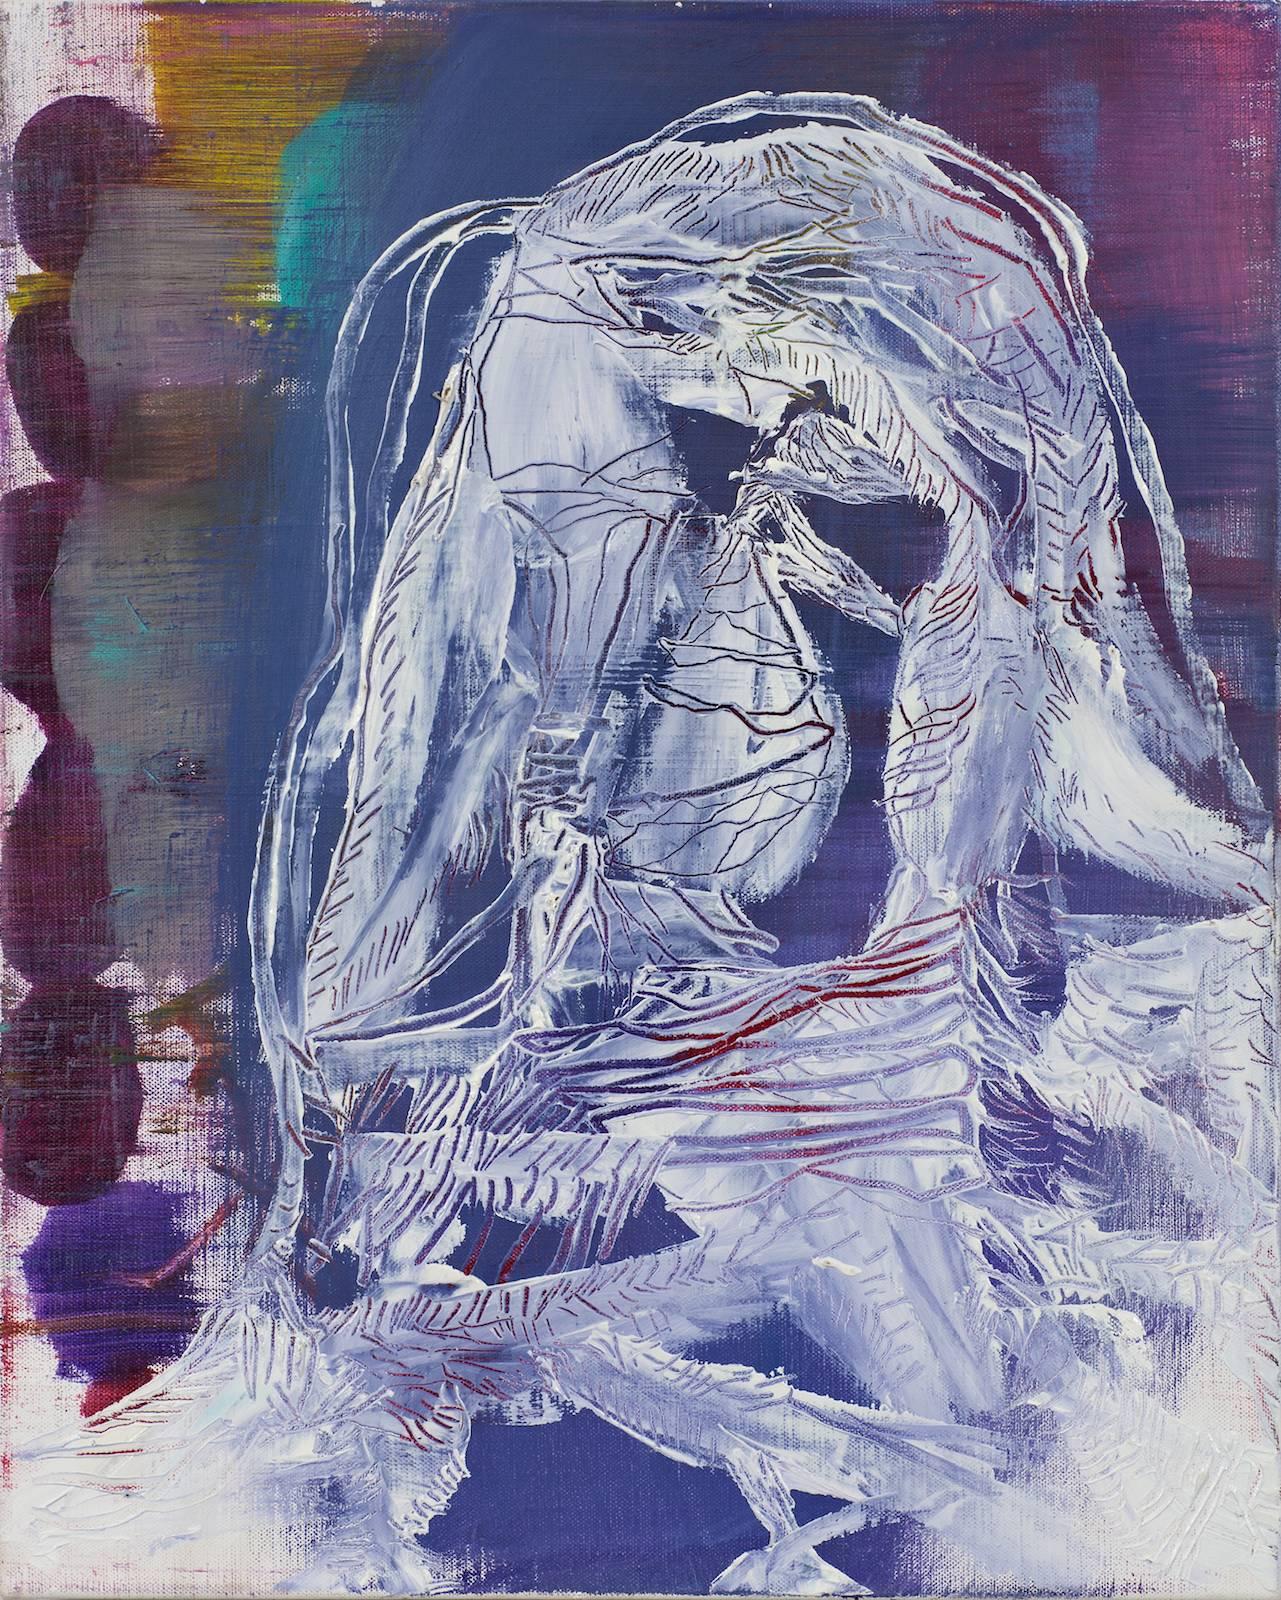 Pan / Grenadine Paintings, 2011, oil on canvas, 52 x 42 cm